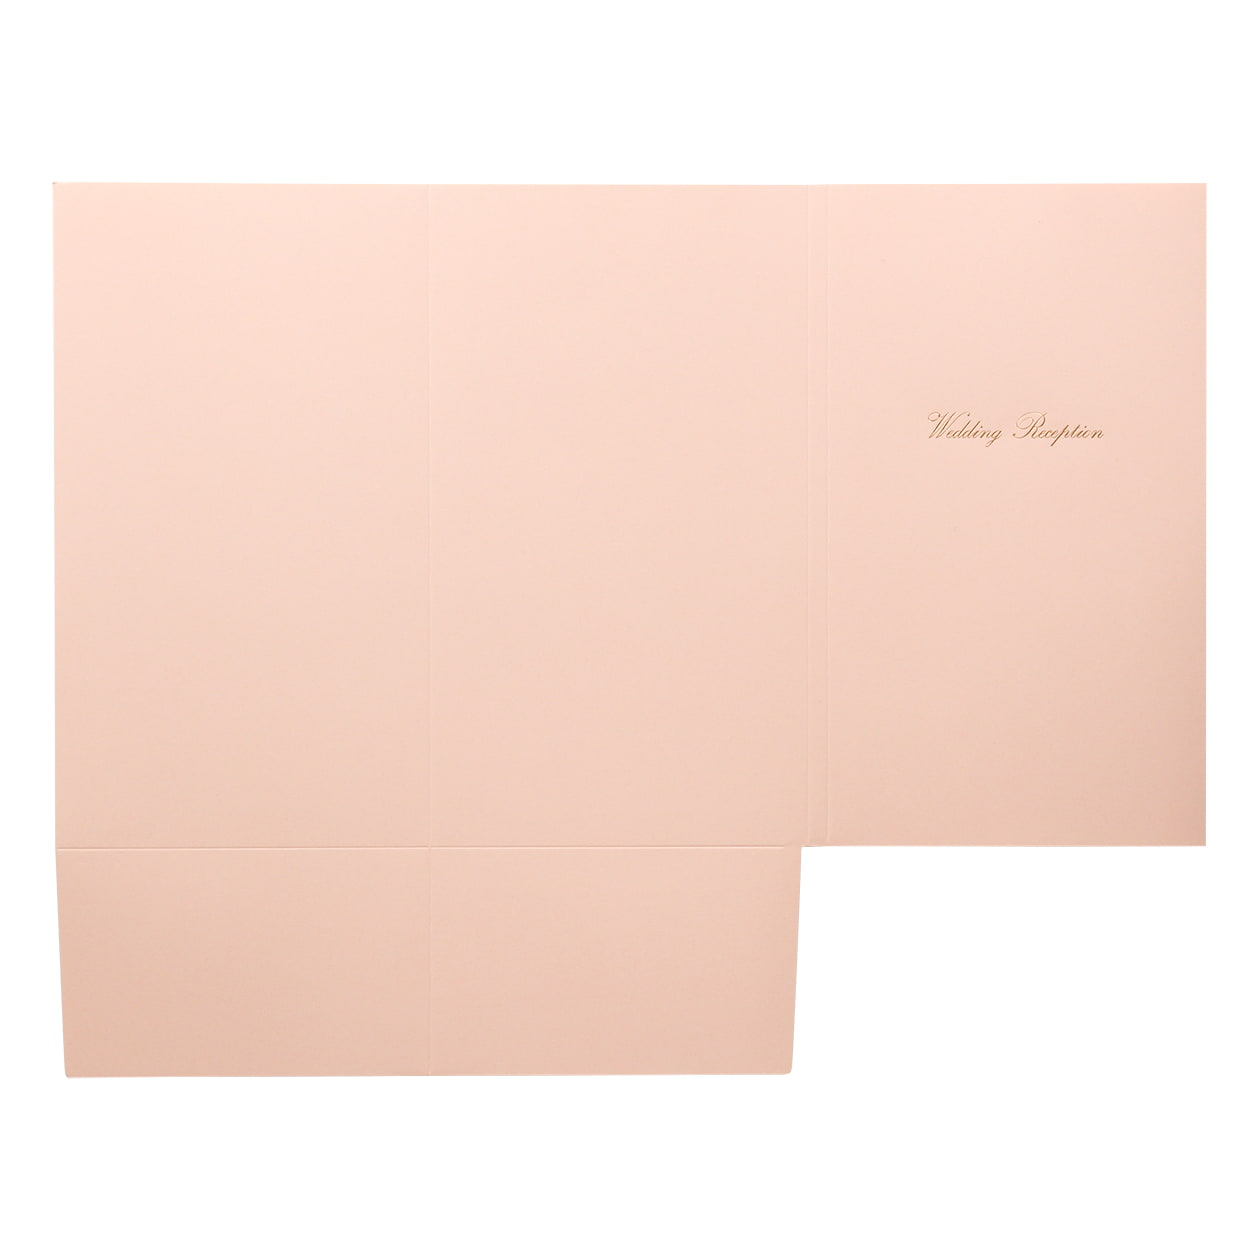 A31フォルダー Pale Pink タイトル 197.7g